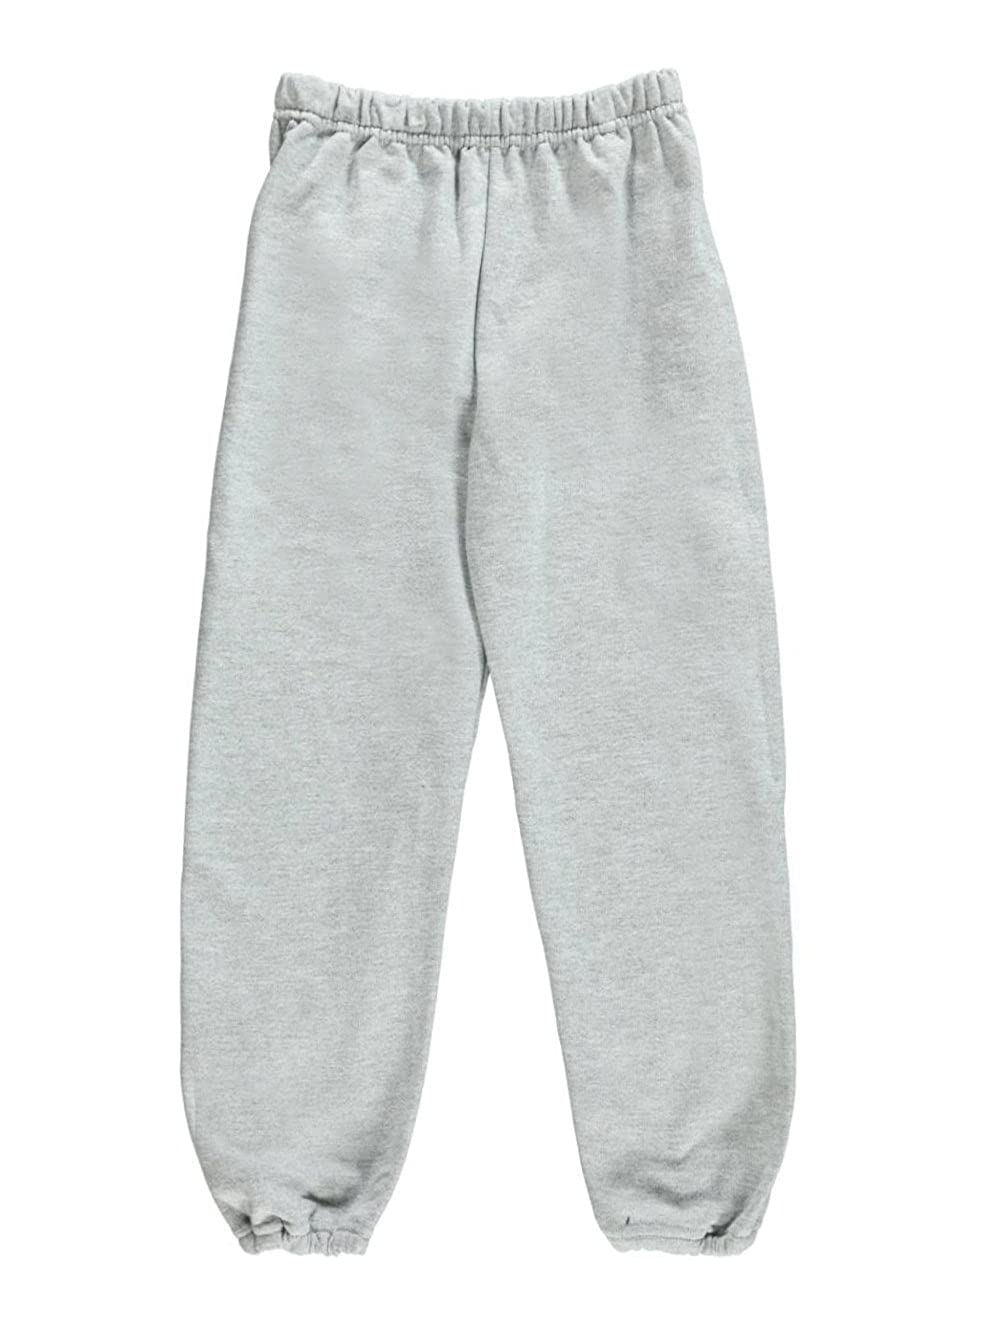 Premium Boys Sweatpants Jogger Pants – Slim Fit – Elastic Waistband & Cuff